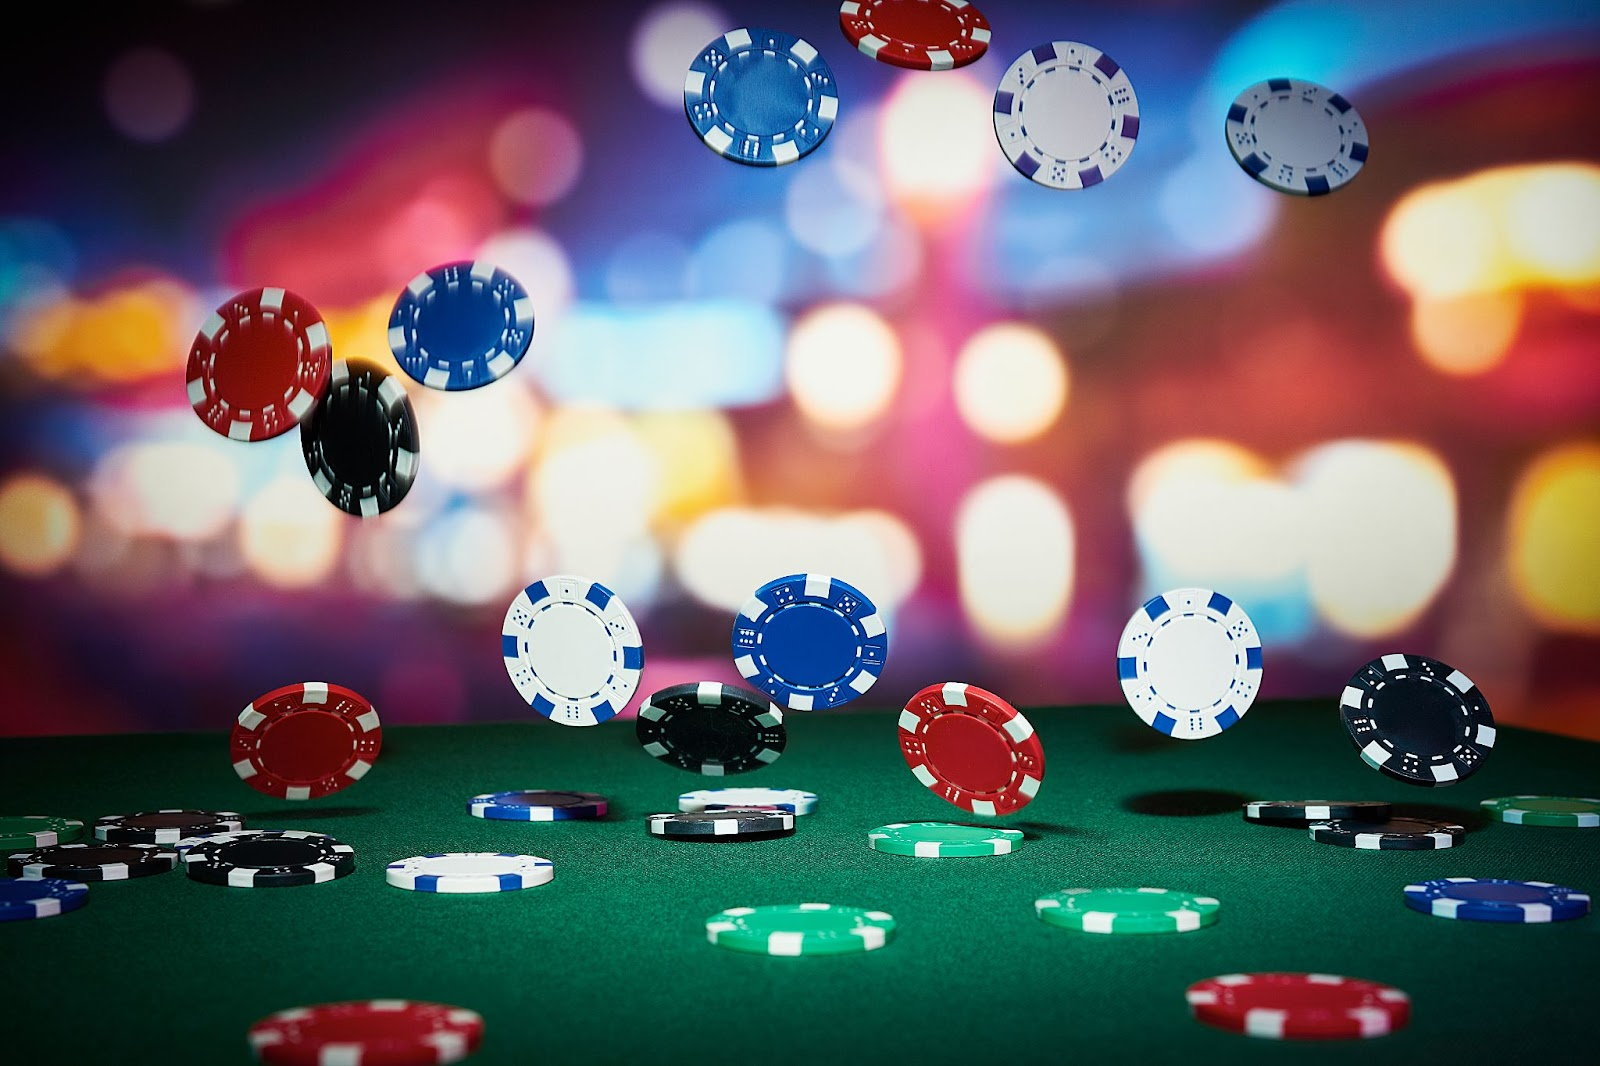 The best casino bonuses at online casinos 2021